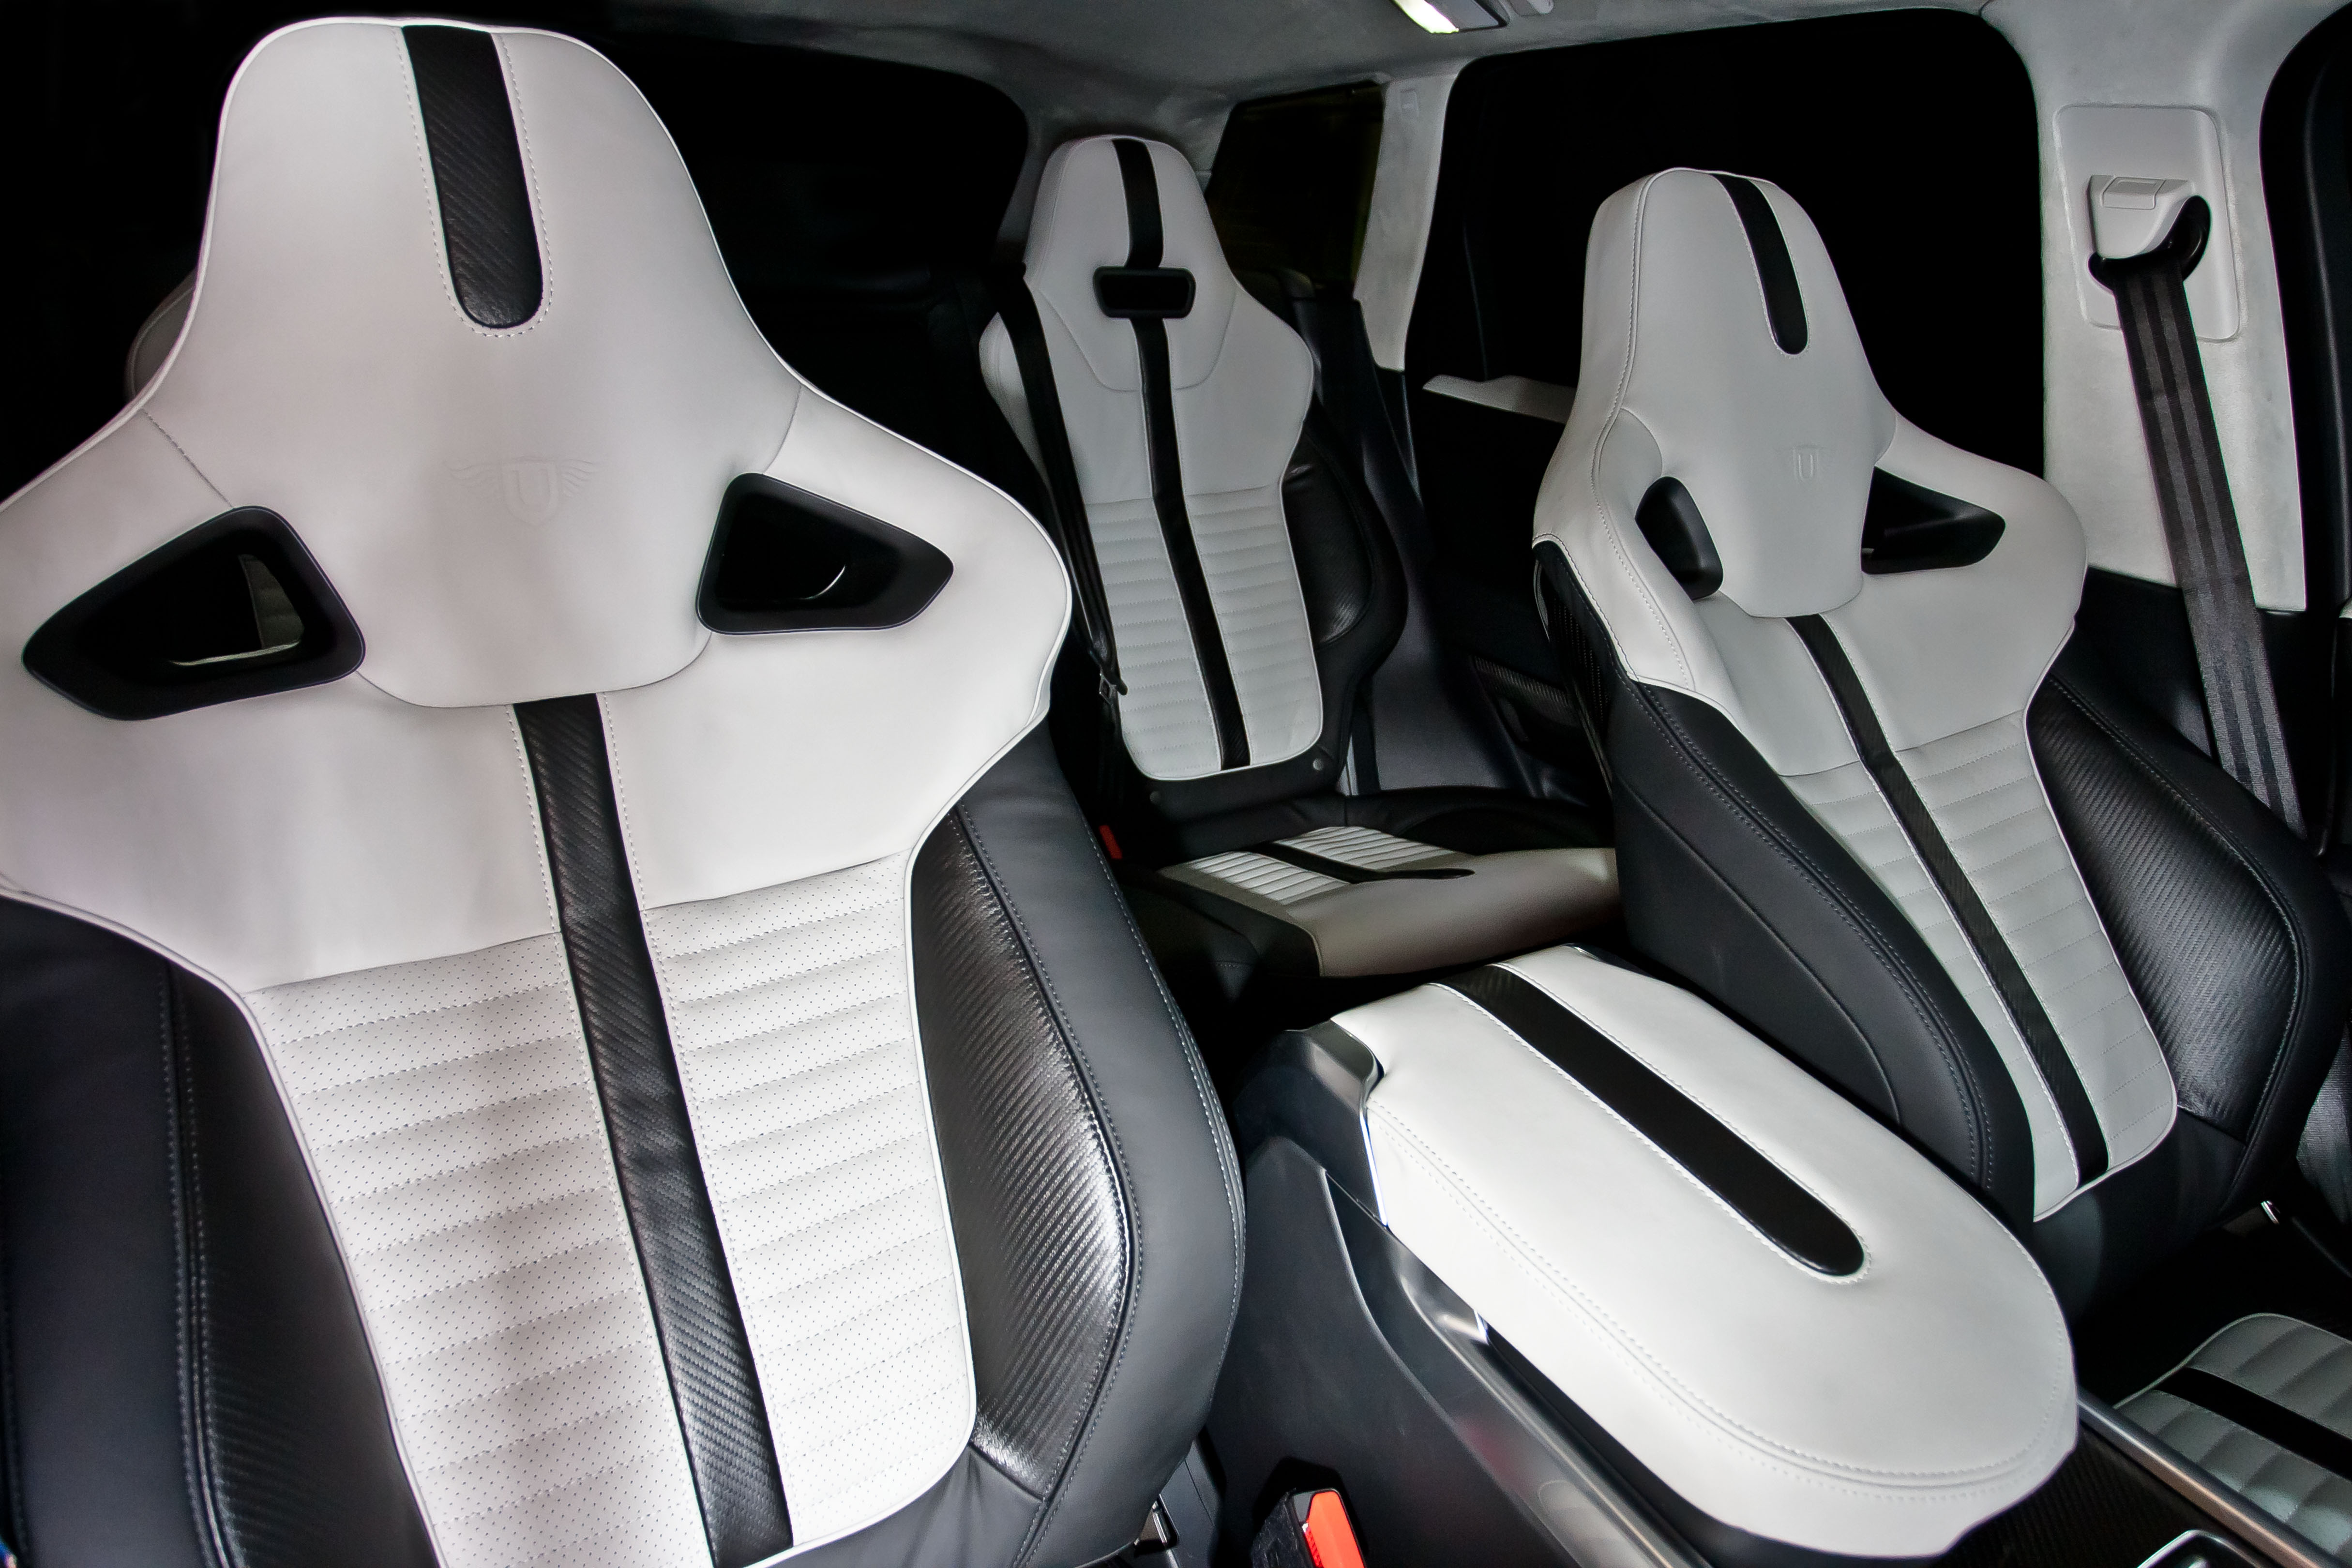 urban svr contrast carbon leather58